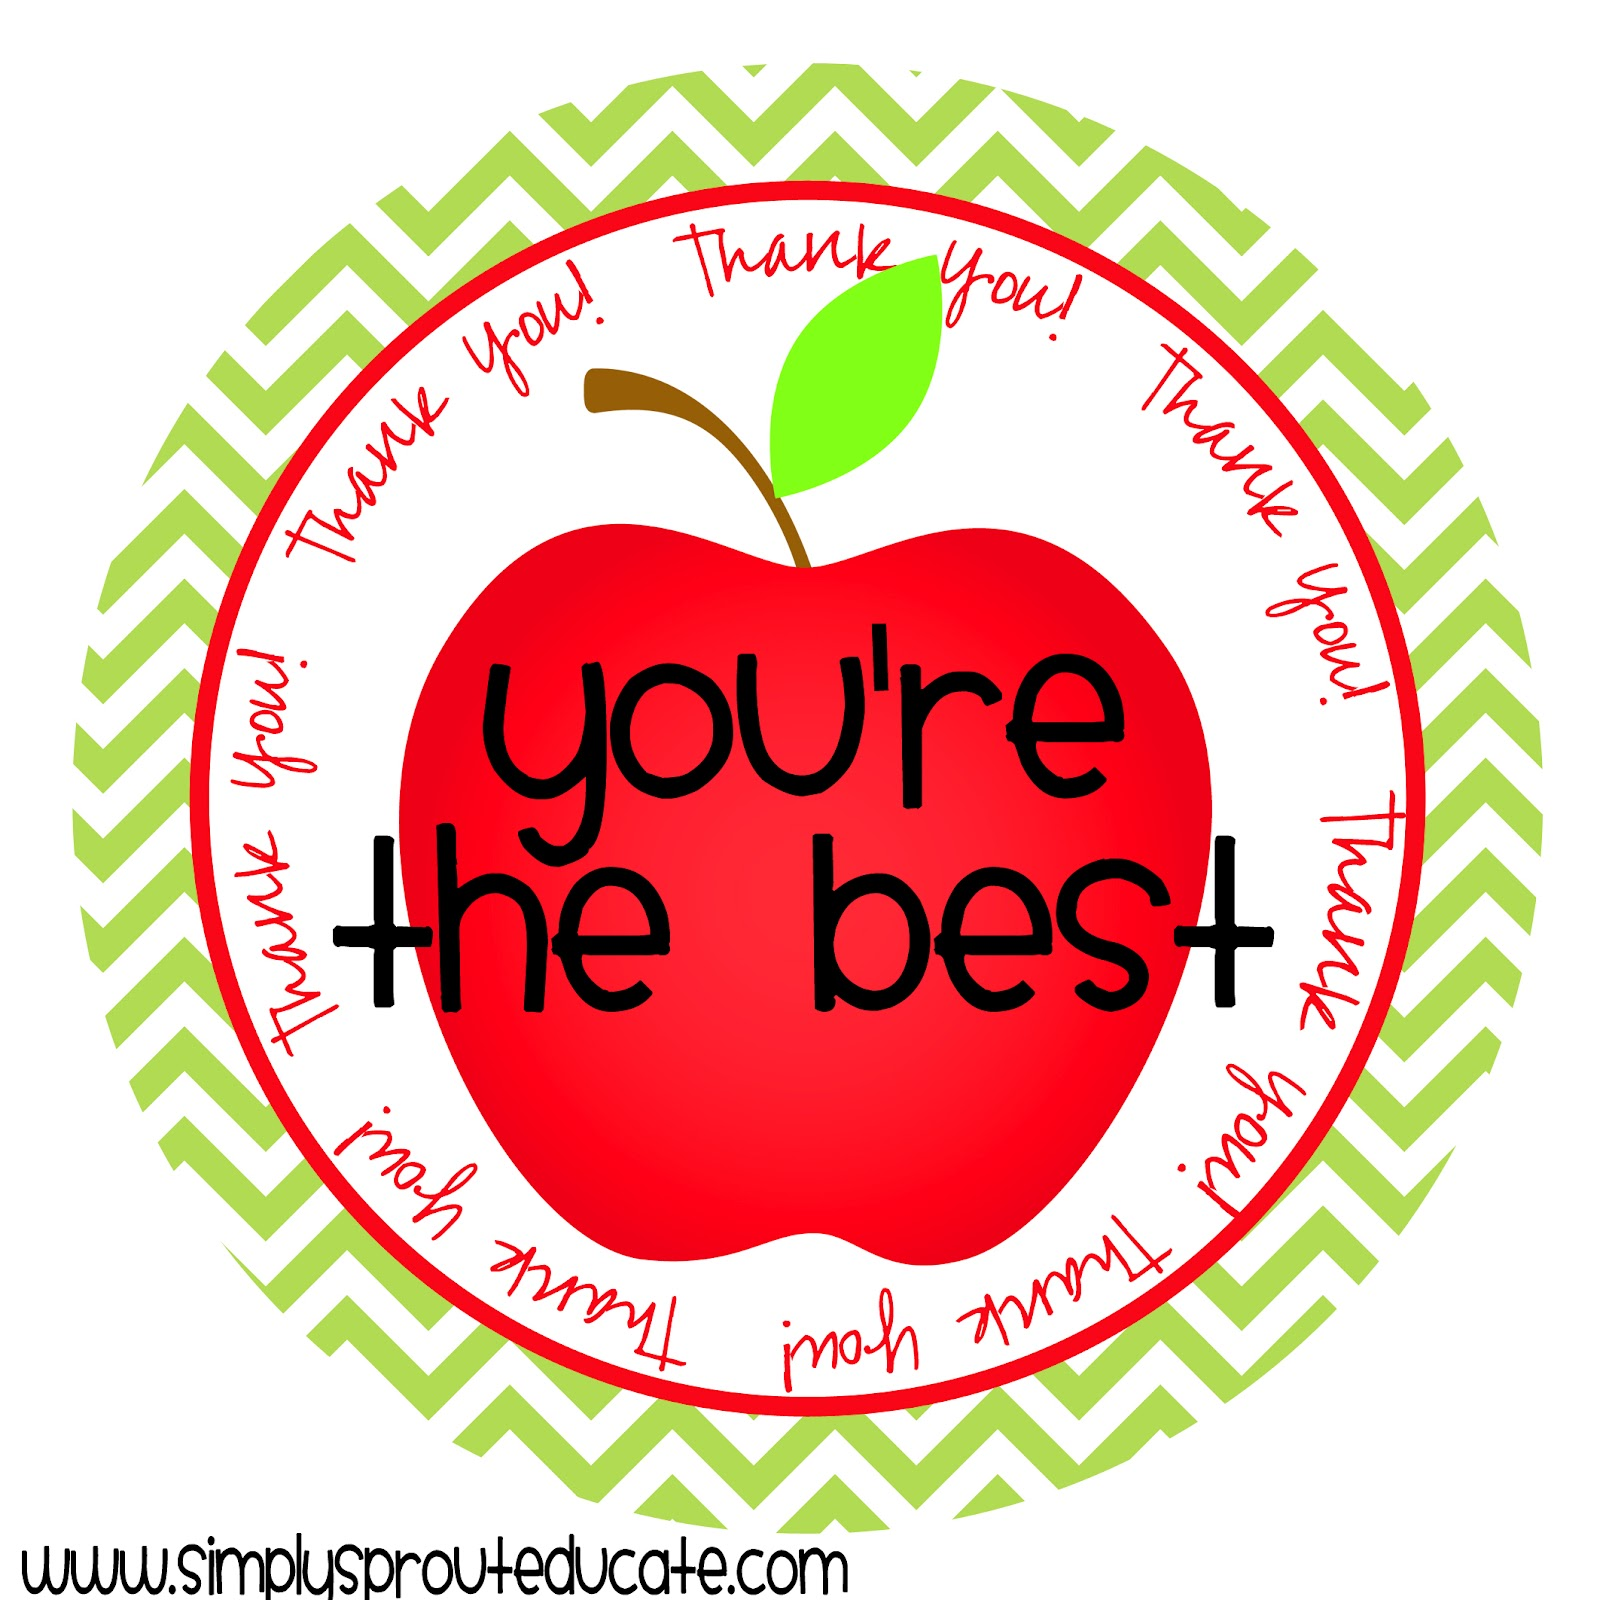 clipart for teachers day - photo #37